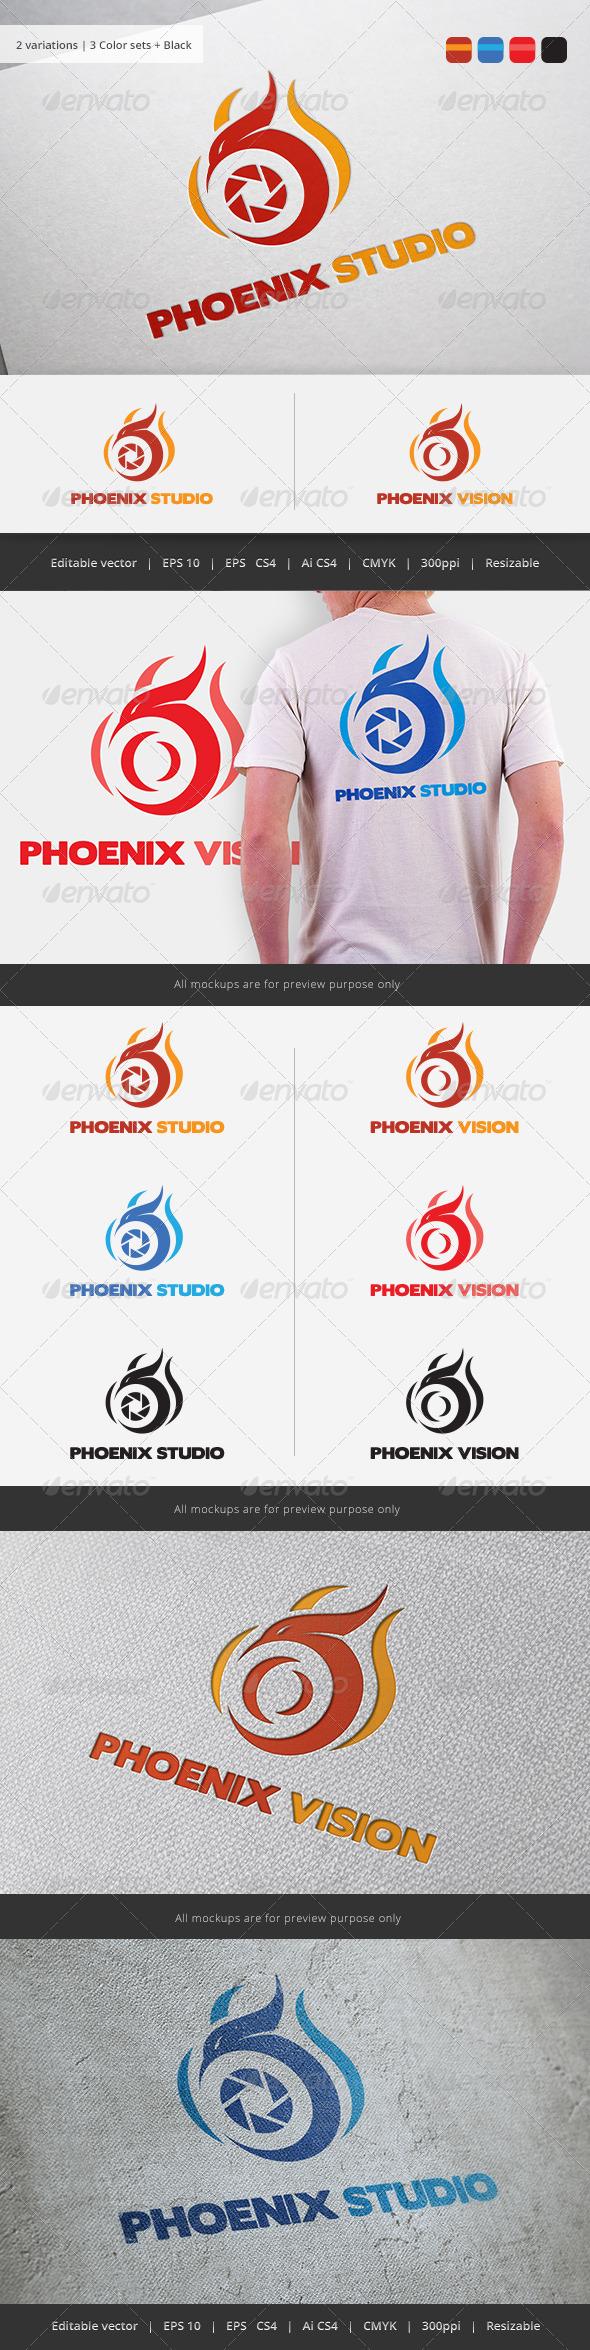 GraphicRiver Phoenix Vision Studio Logo 5781701